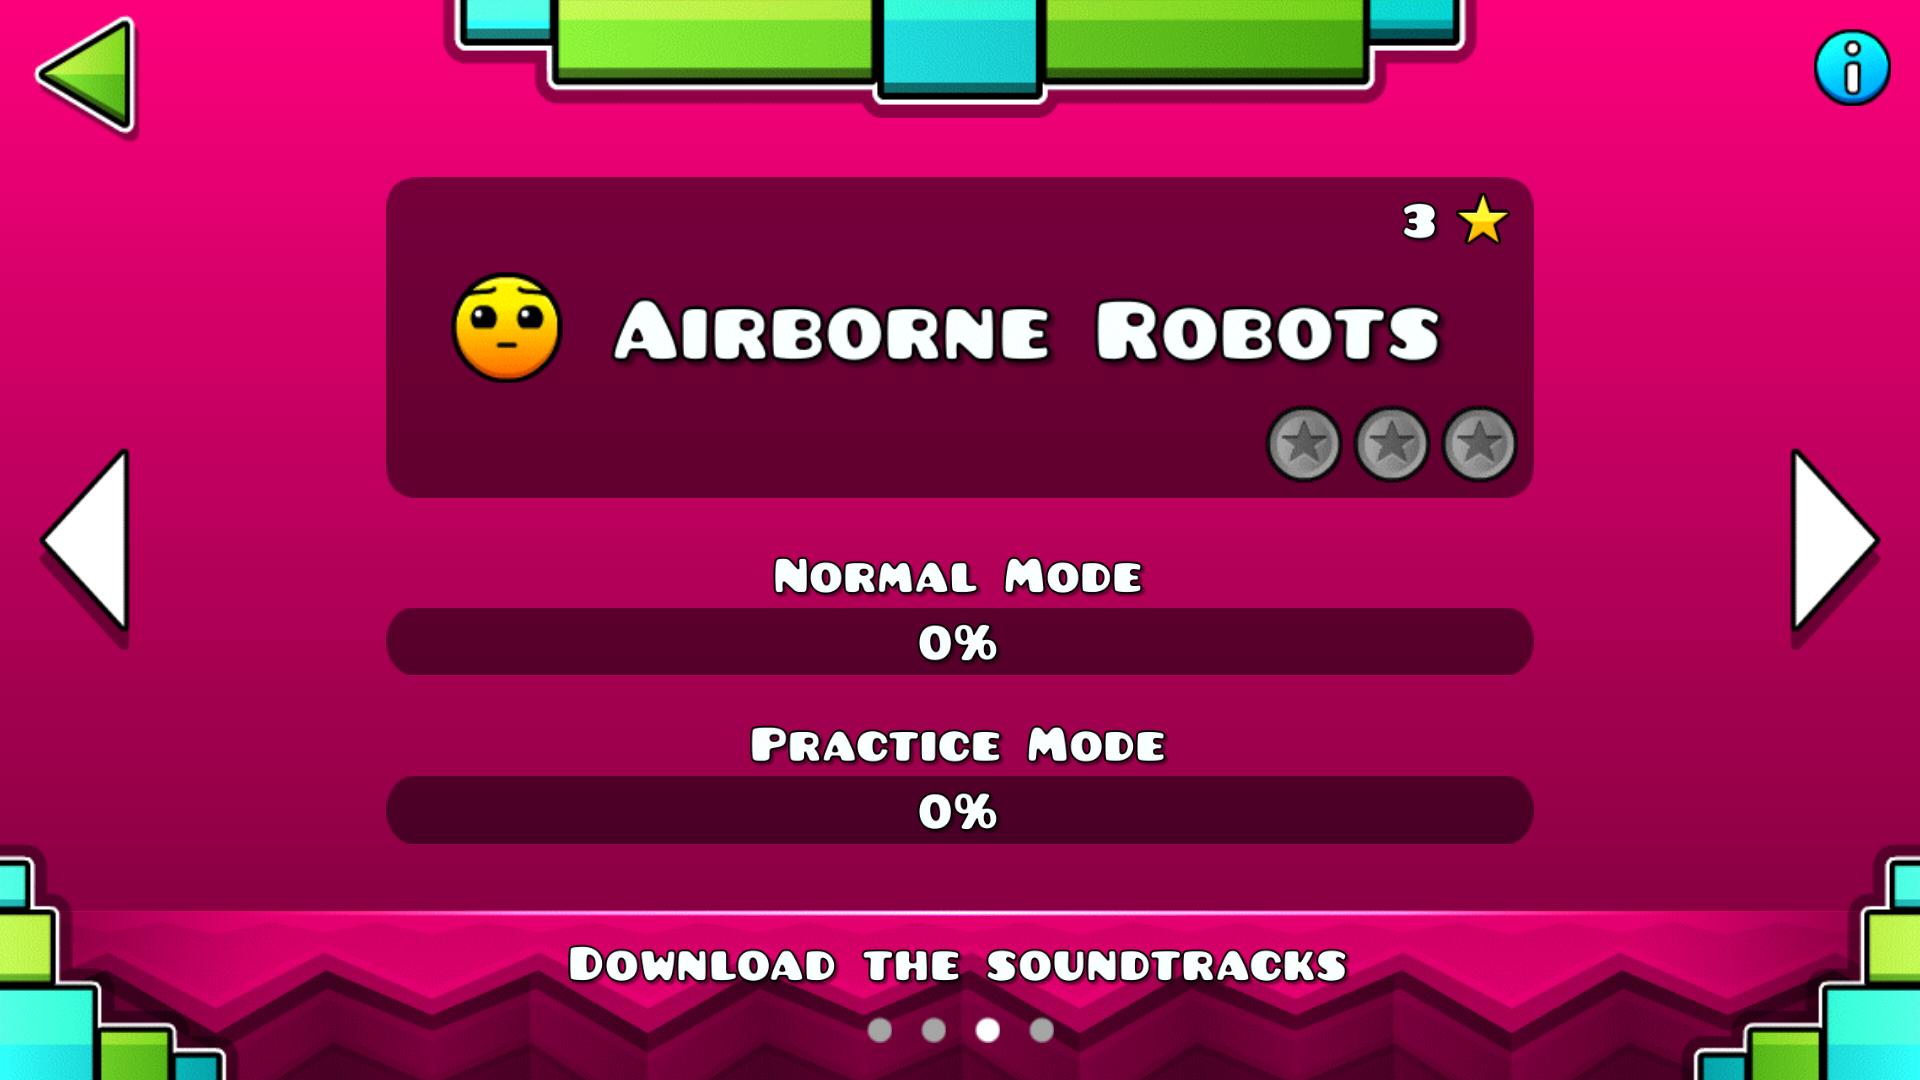 AirborneRobotsMenu.png